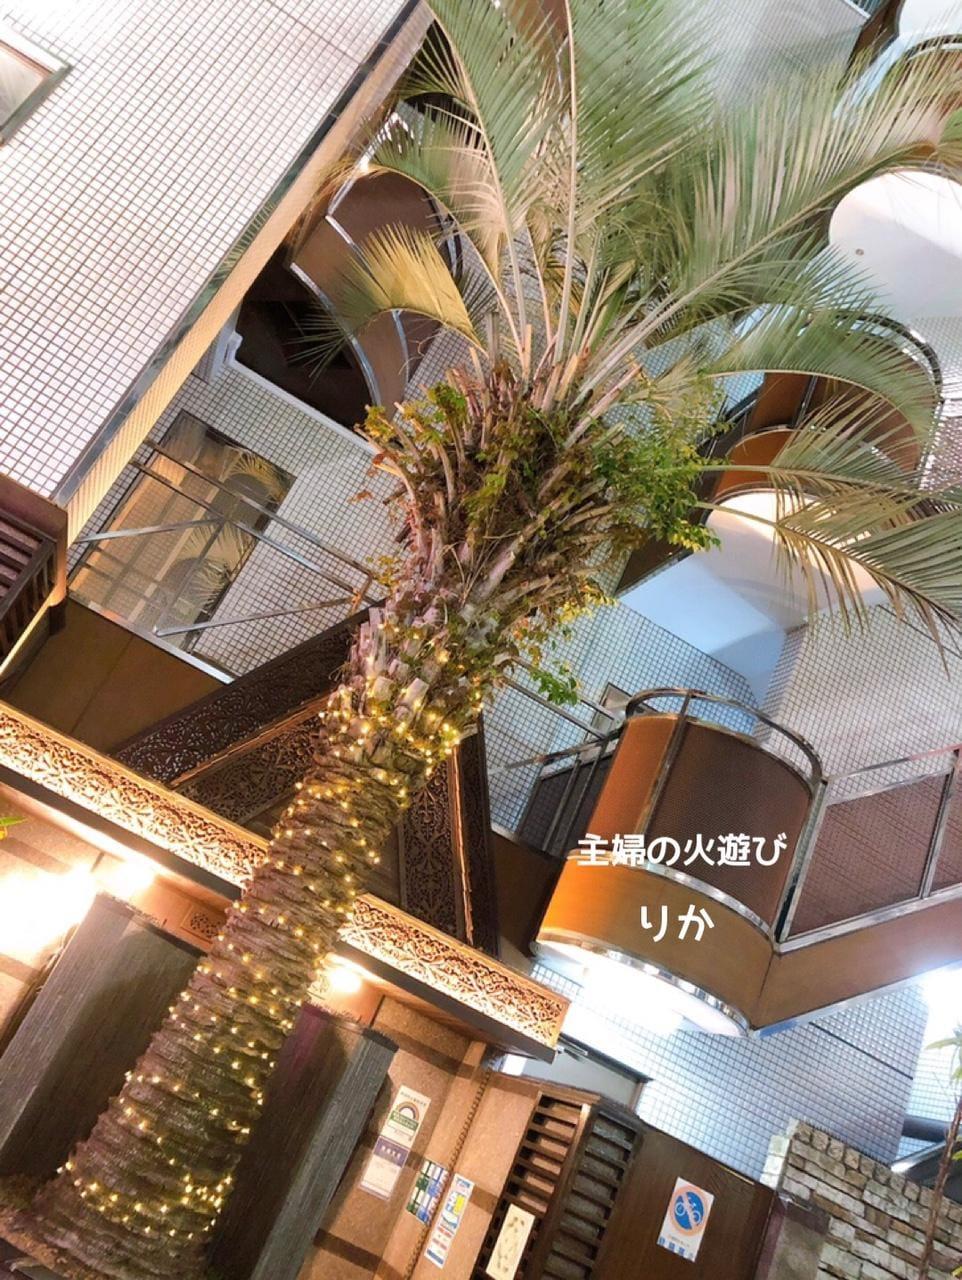 「■(*⃙⃘´꒳`*⃙⃘)THANKS■」05/06日(木) 23:36 | りかの写メ・風俗動画